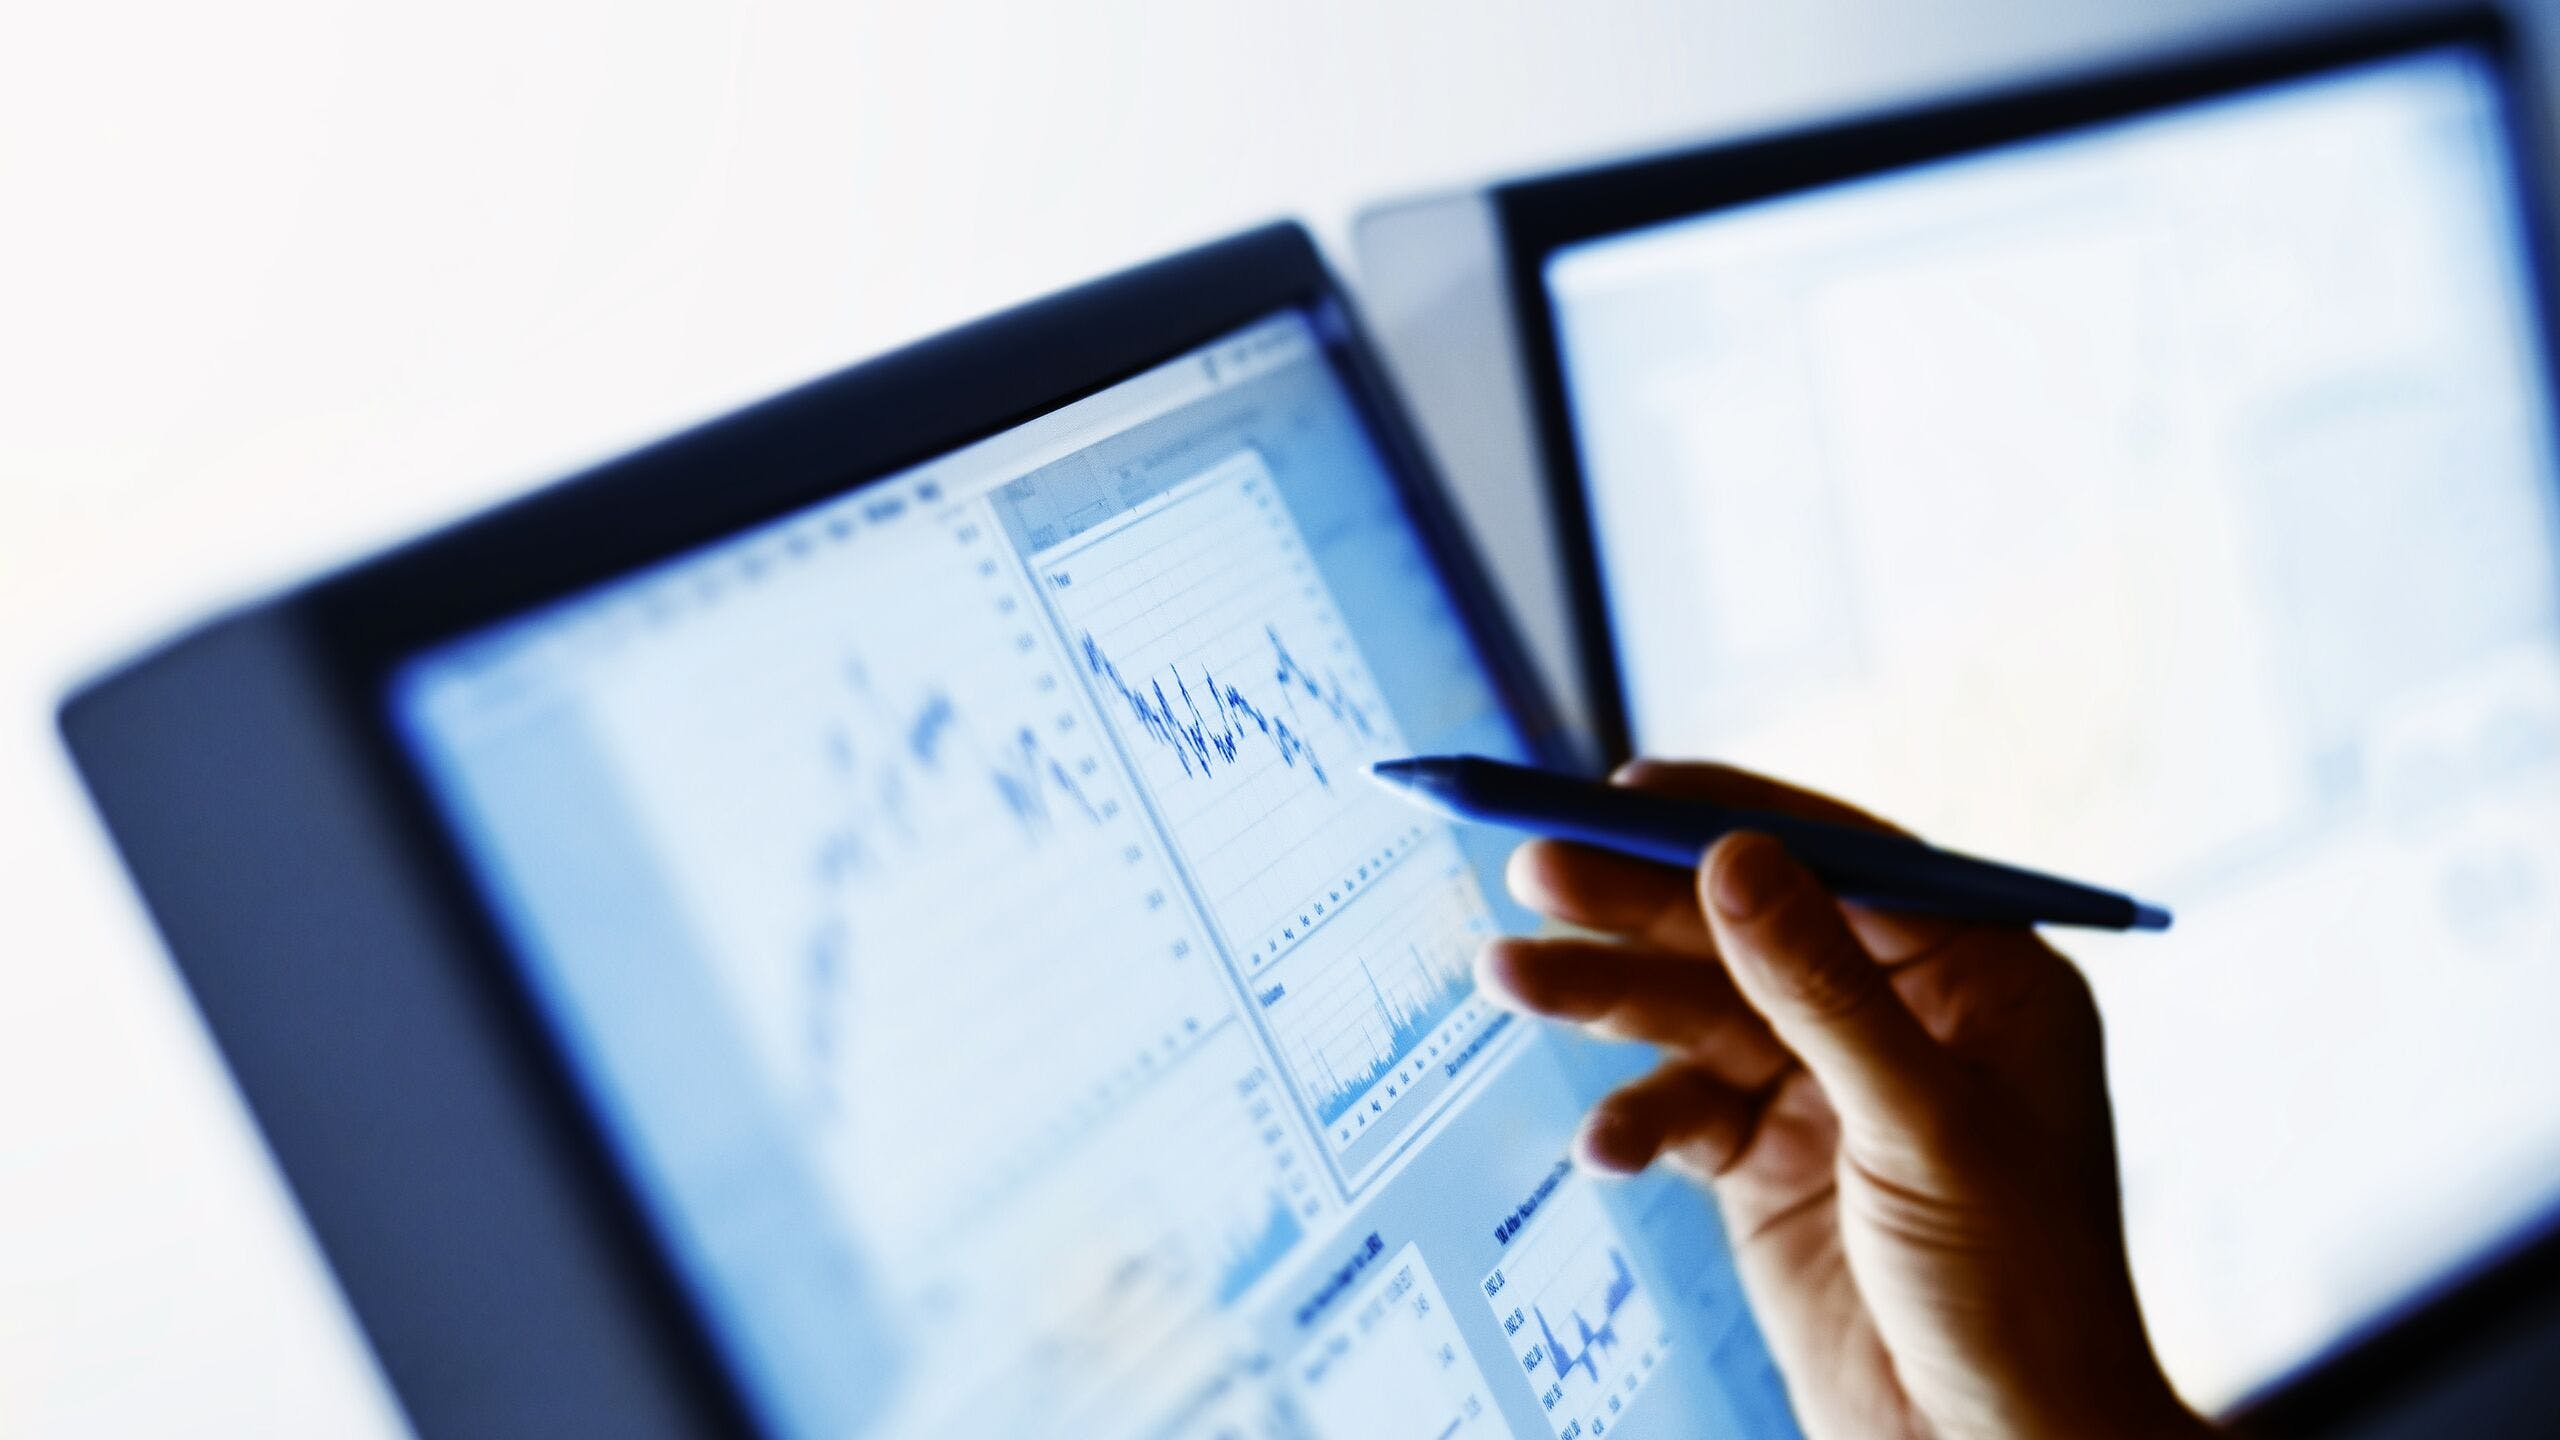 AXA Luxembourg - L'art d'orchestrer les déductions fiscales